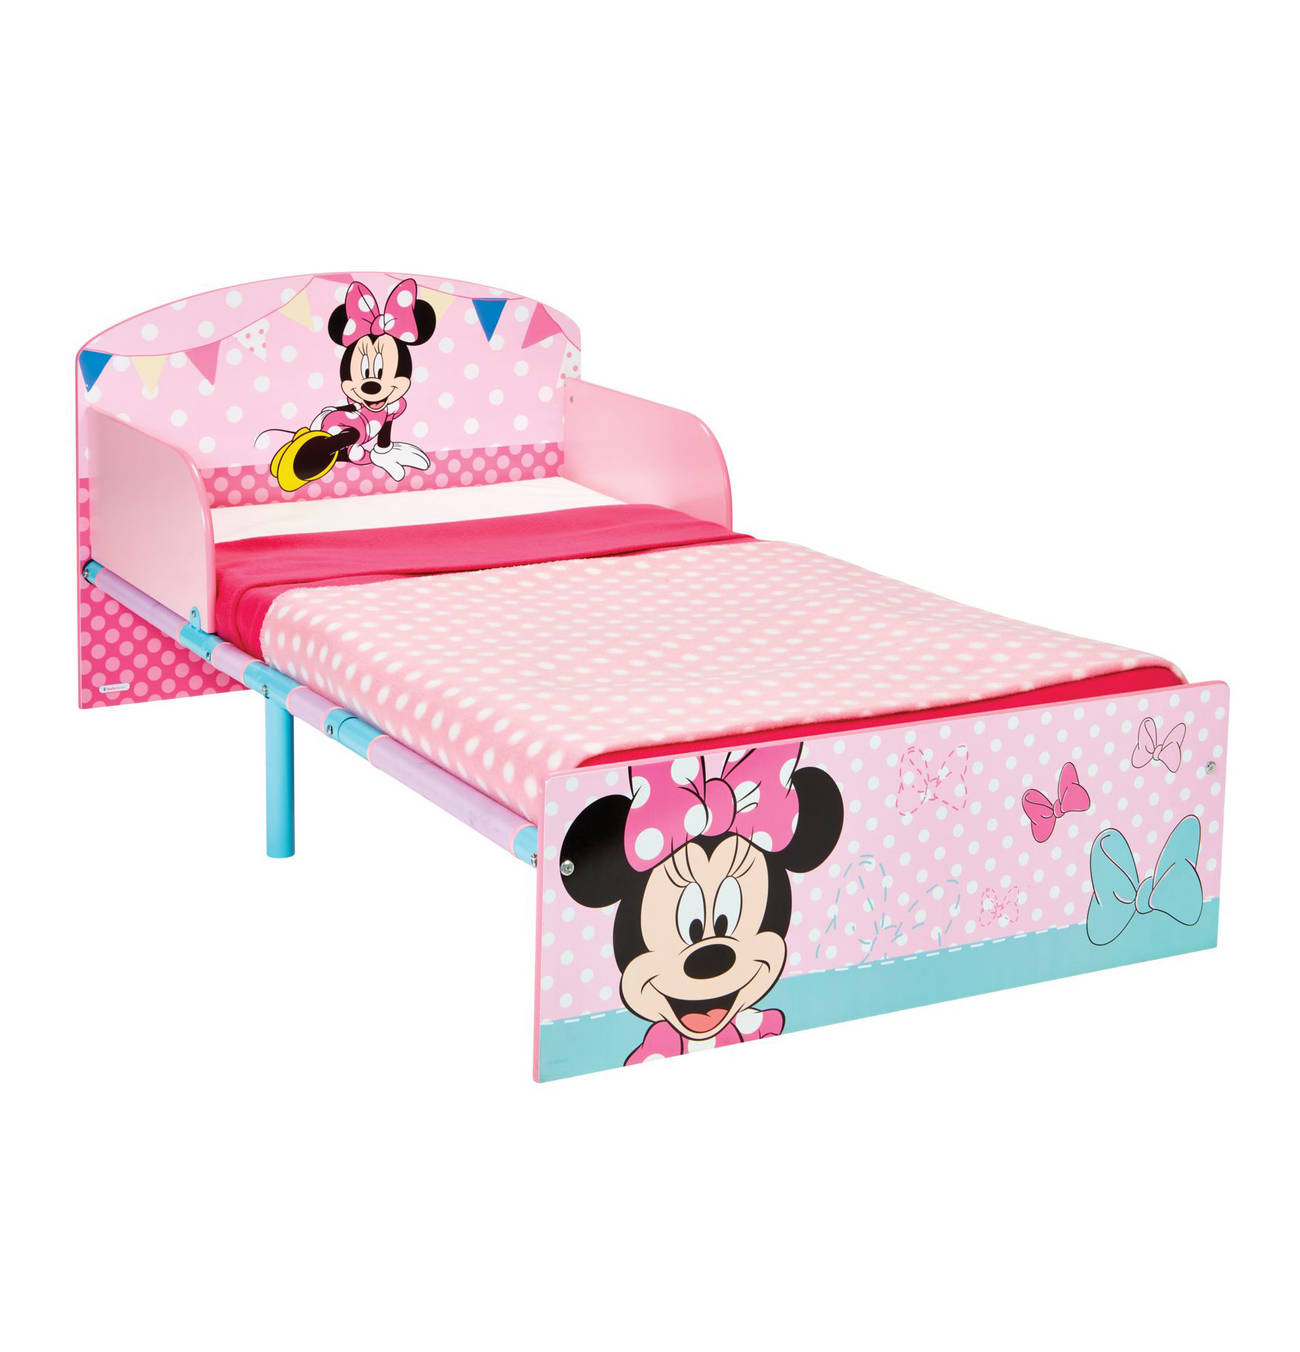 Kinderbett Minnie Kleinkind Bett Bett Matratze